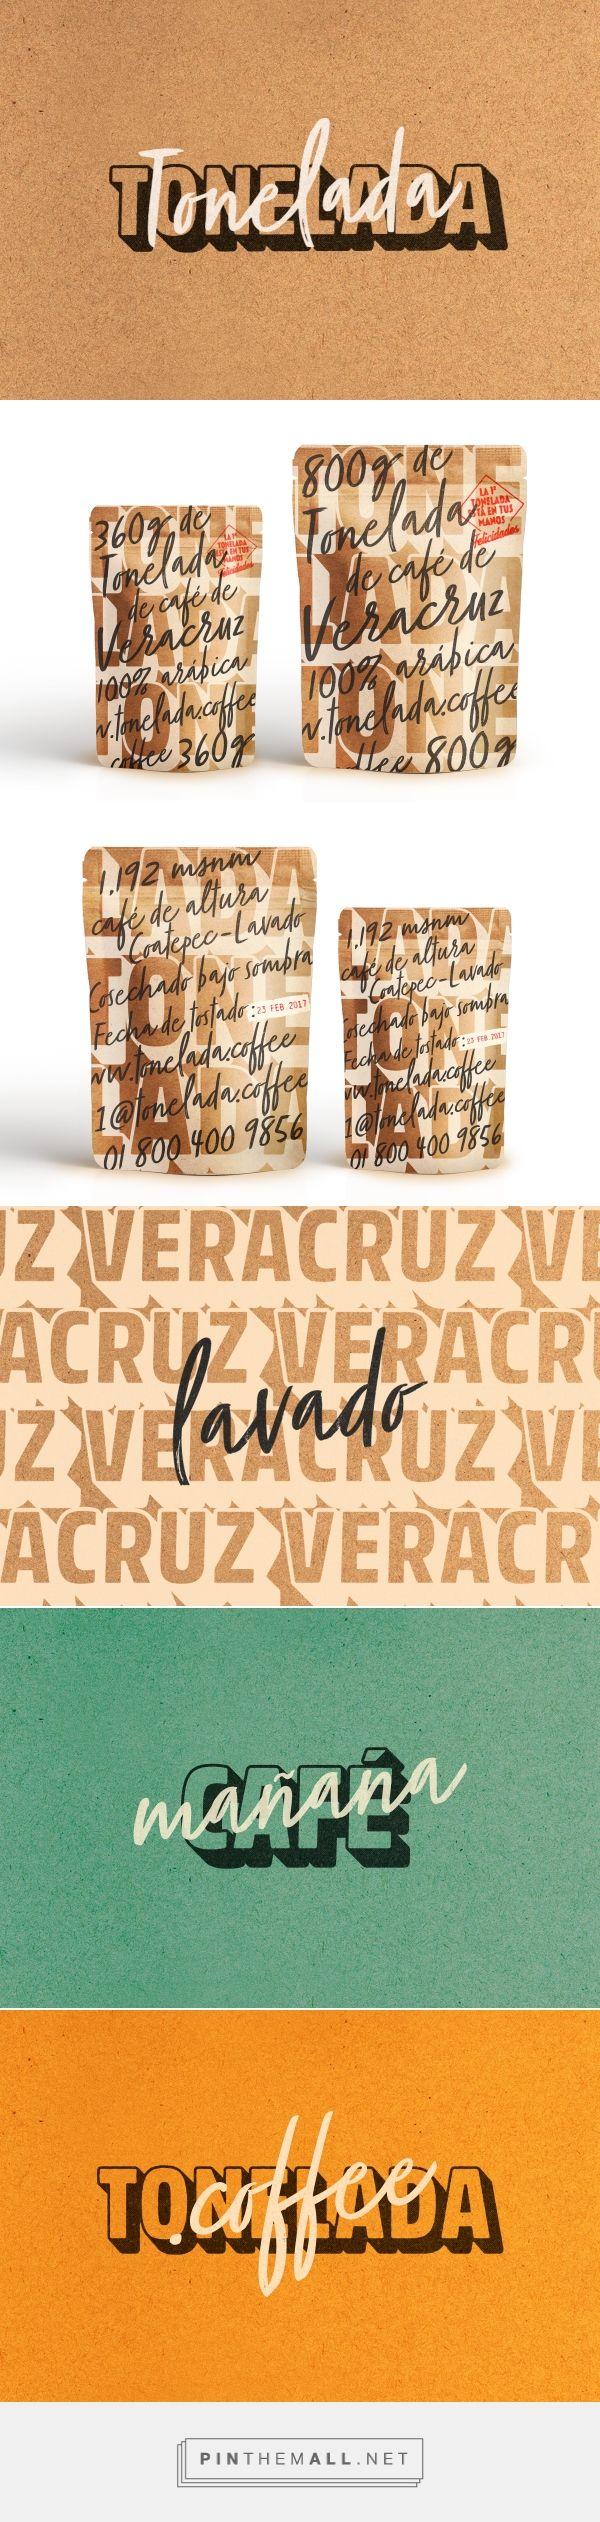 Tonelada Coffee packaging design by YuJo! Creatividad Aplicada - http://www.packagingoftheworld.com/2017/03/tonelada-coffee.html